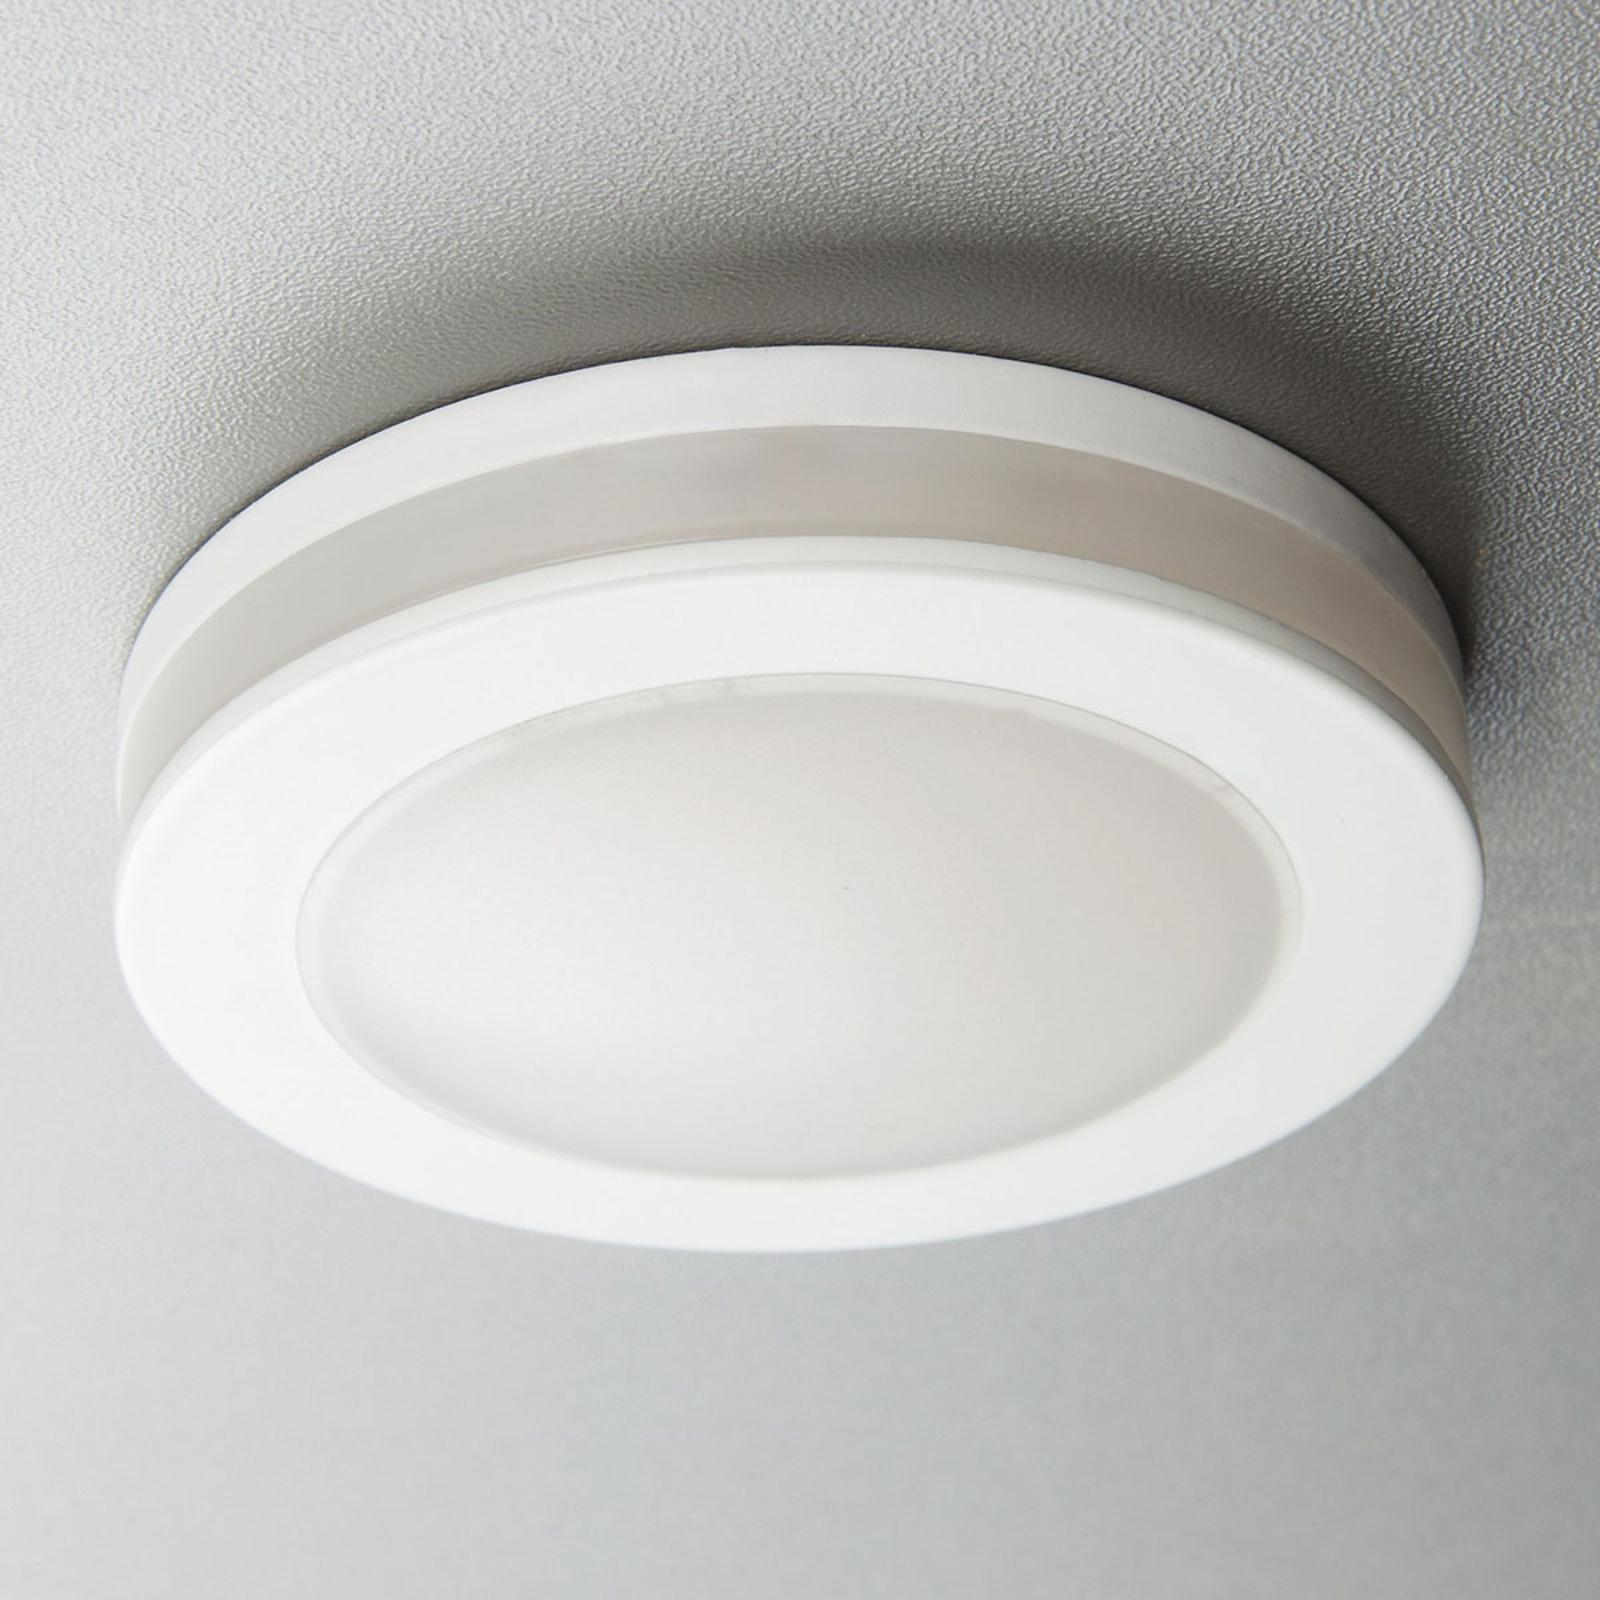 LED Einbaustrahler Artemis 6 W weiß